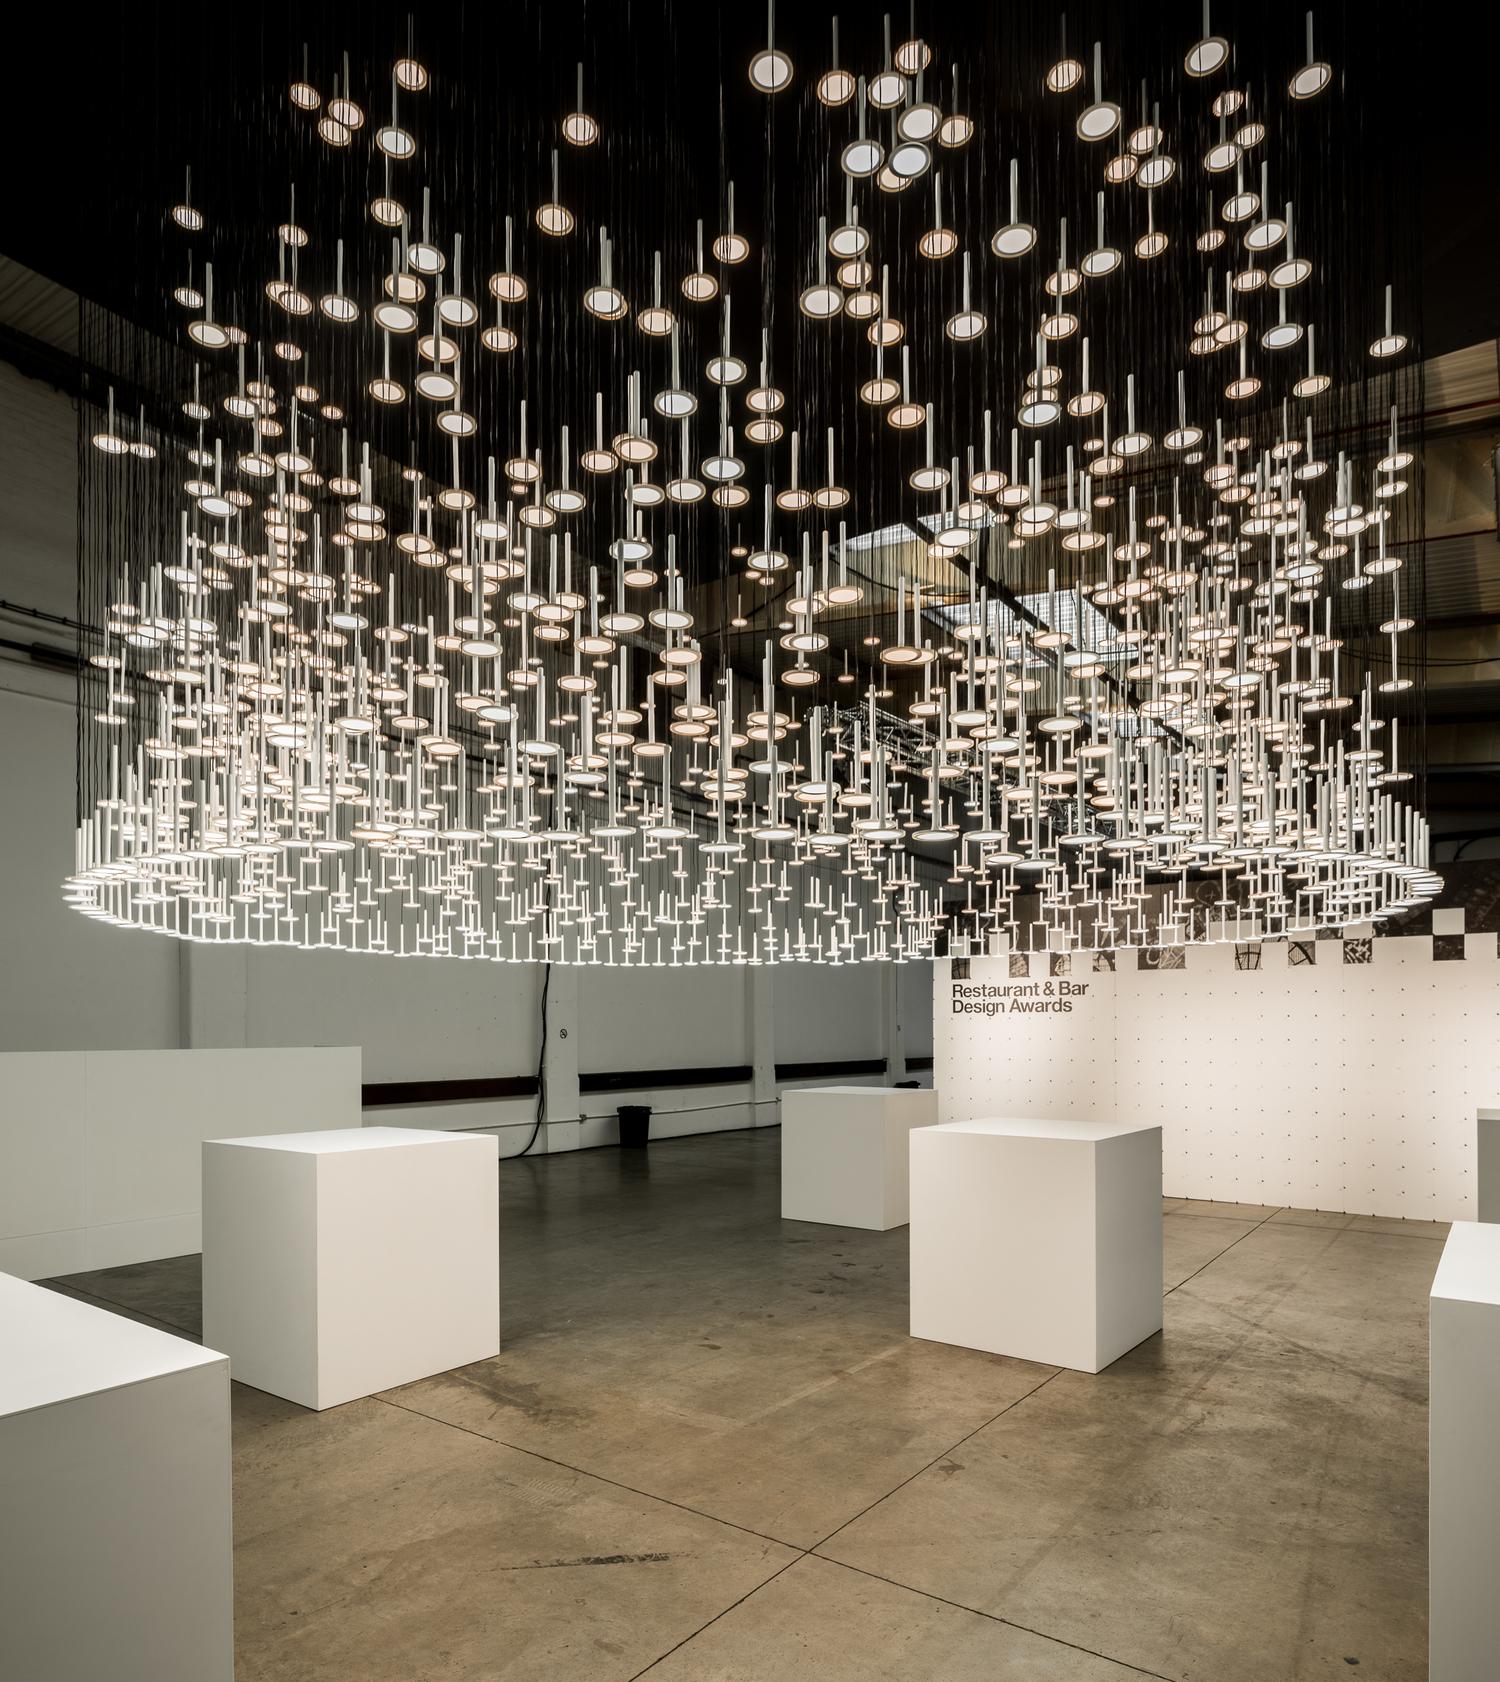 richard lewisohn photographer - architecture/interiors